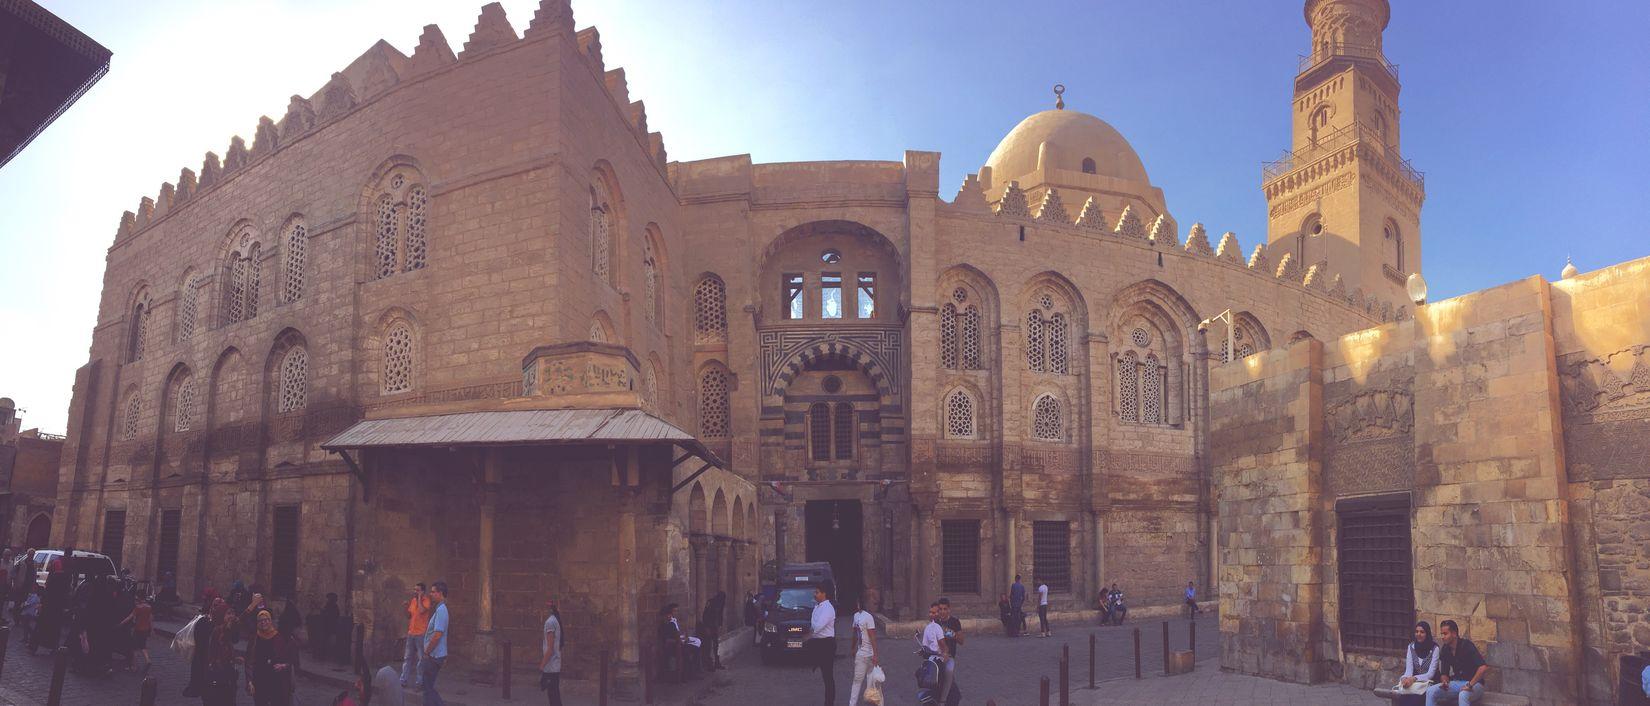 Cairo Oldcairo Egypt Thisisegypt Islamic Art Islamic Islamic Architecture Mosque VisitEgypt Myegypt Moezstreet